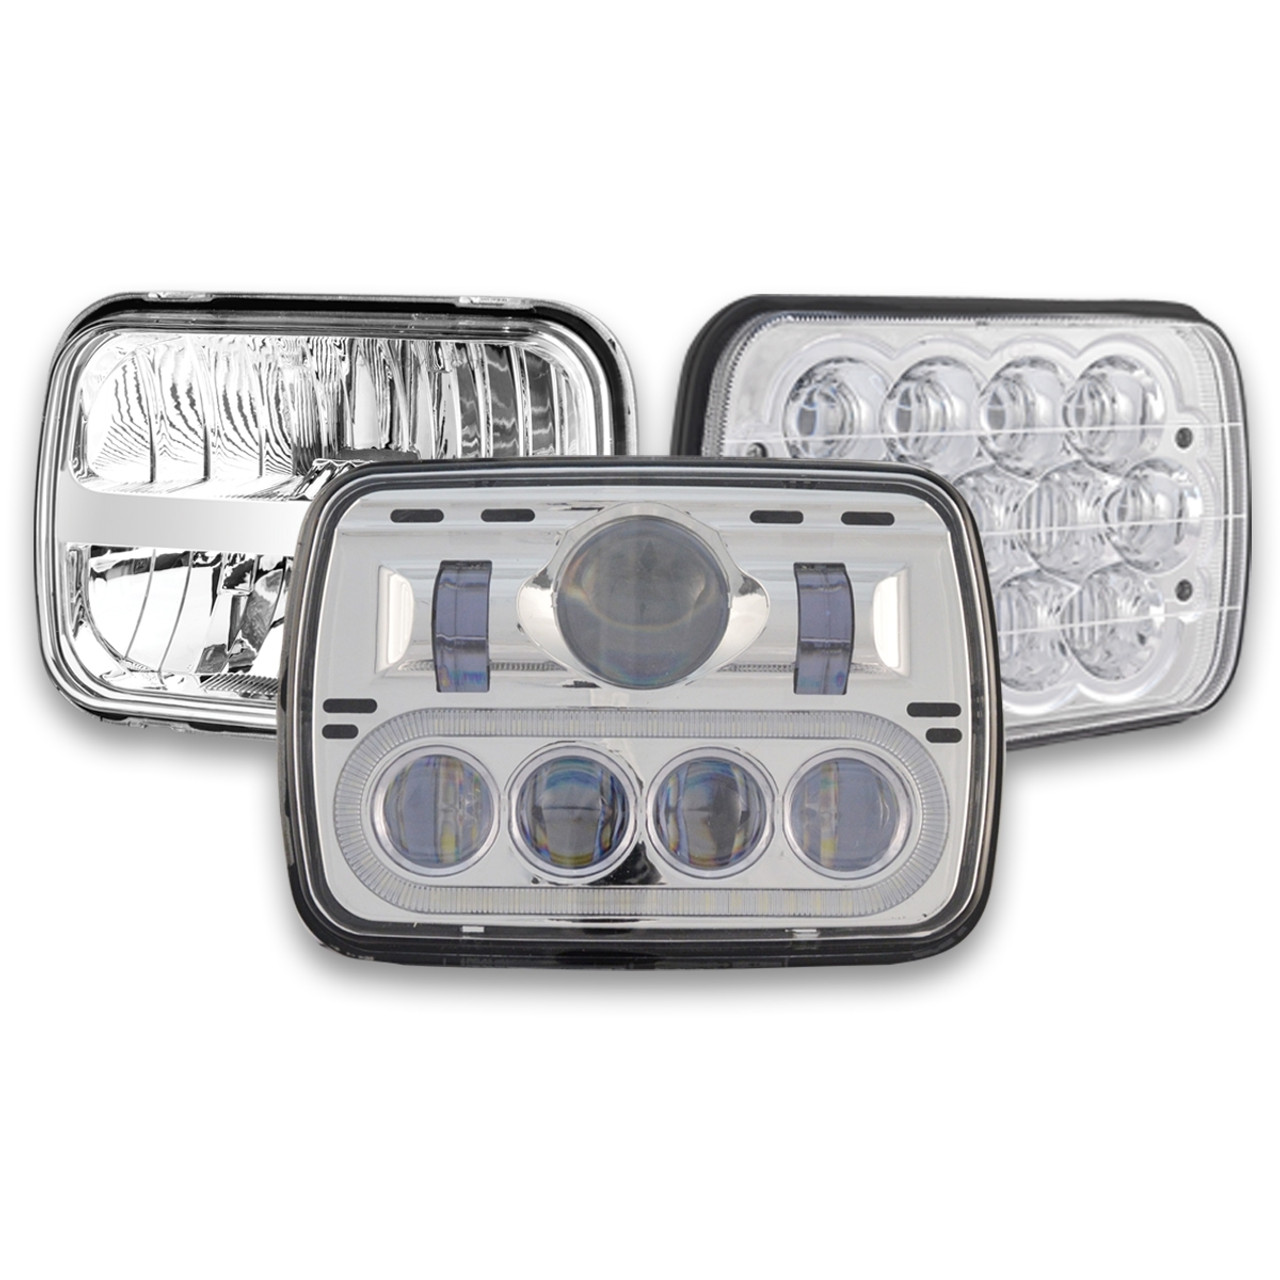 "5"" x 7"" LED Headlight"